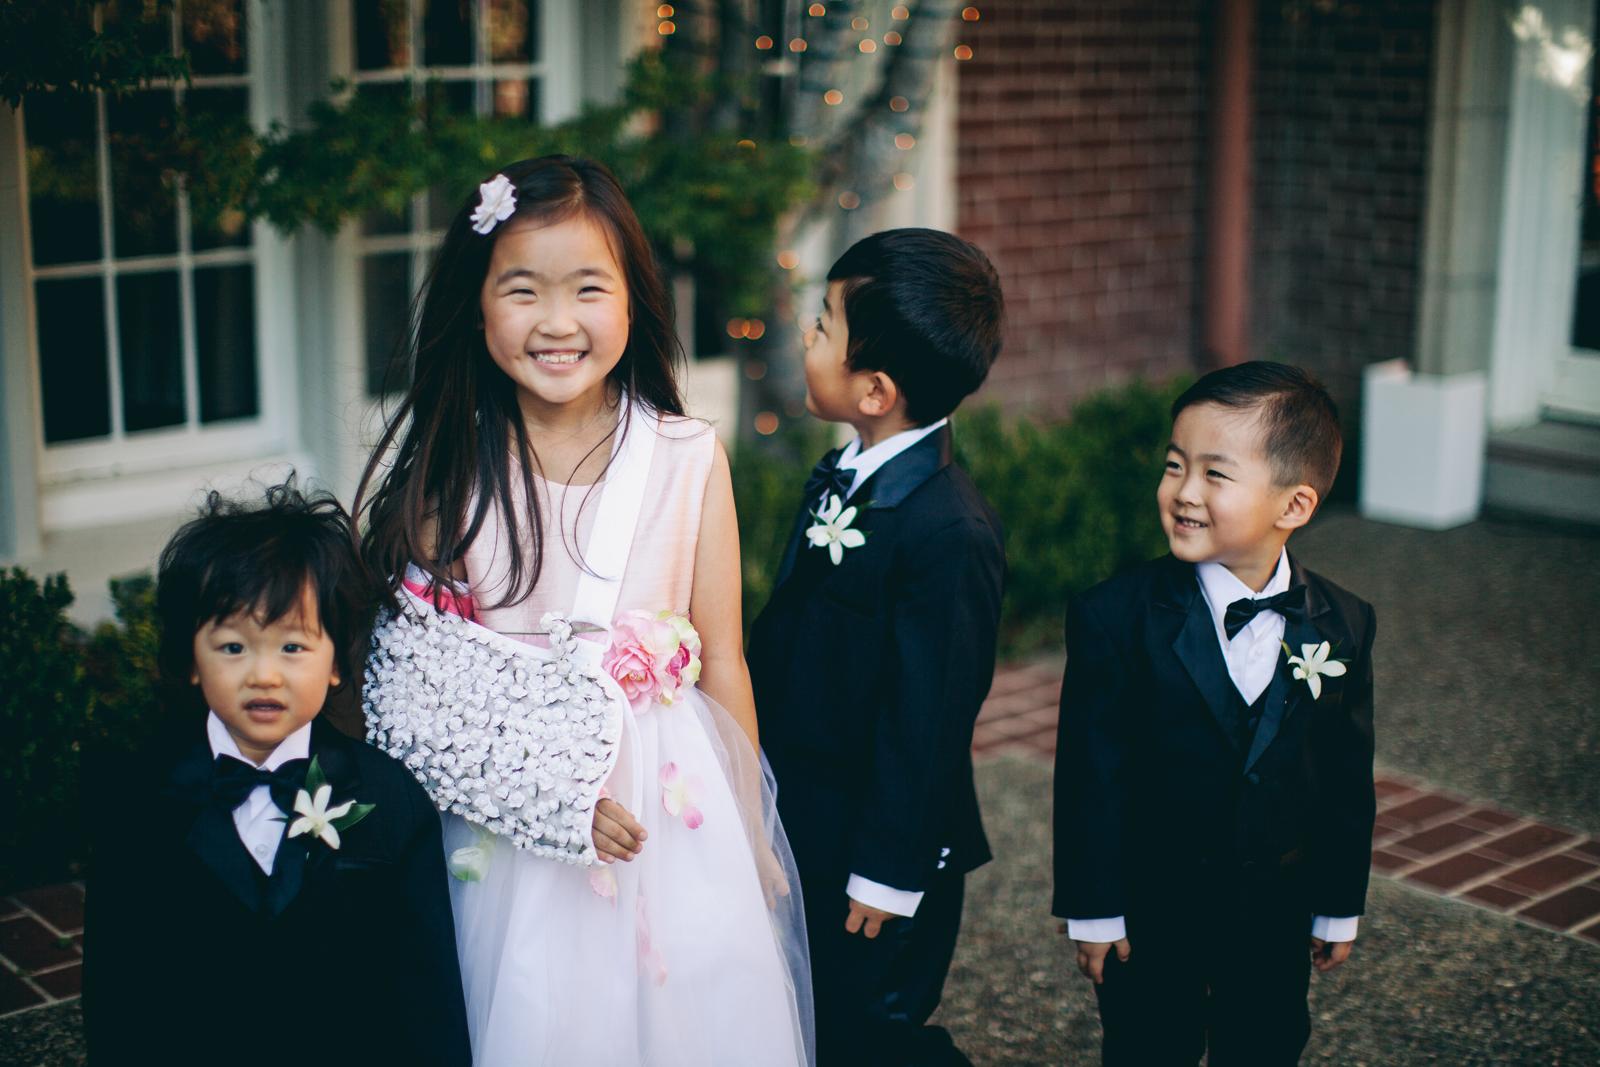 kohl_manison_wedding_photography_sarah_eric_ebony_siovhan_bokeh_photography_038.jpg